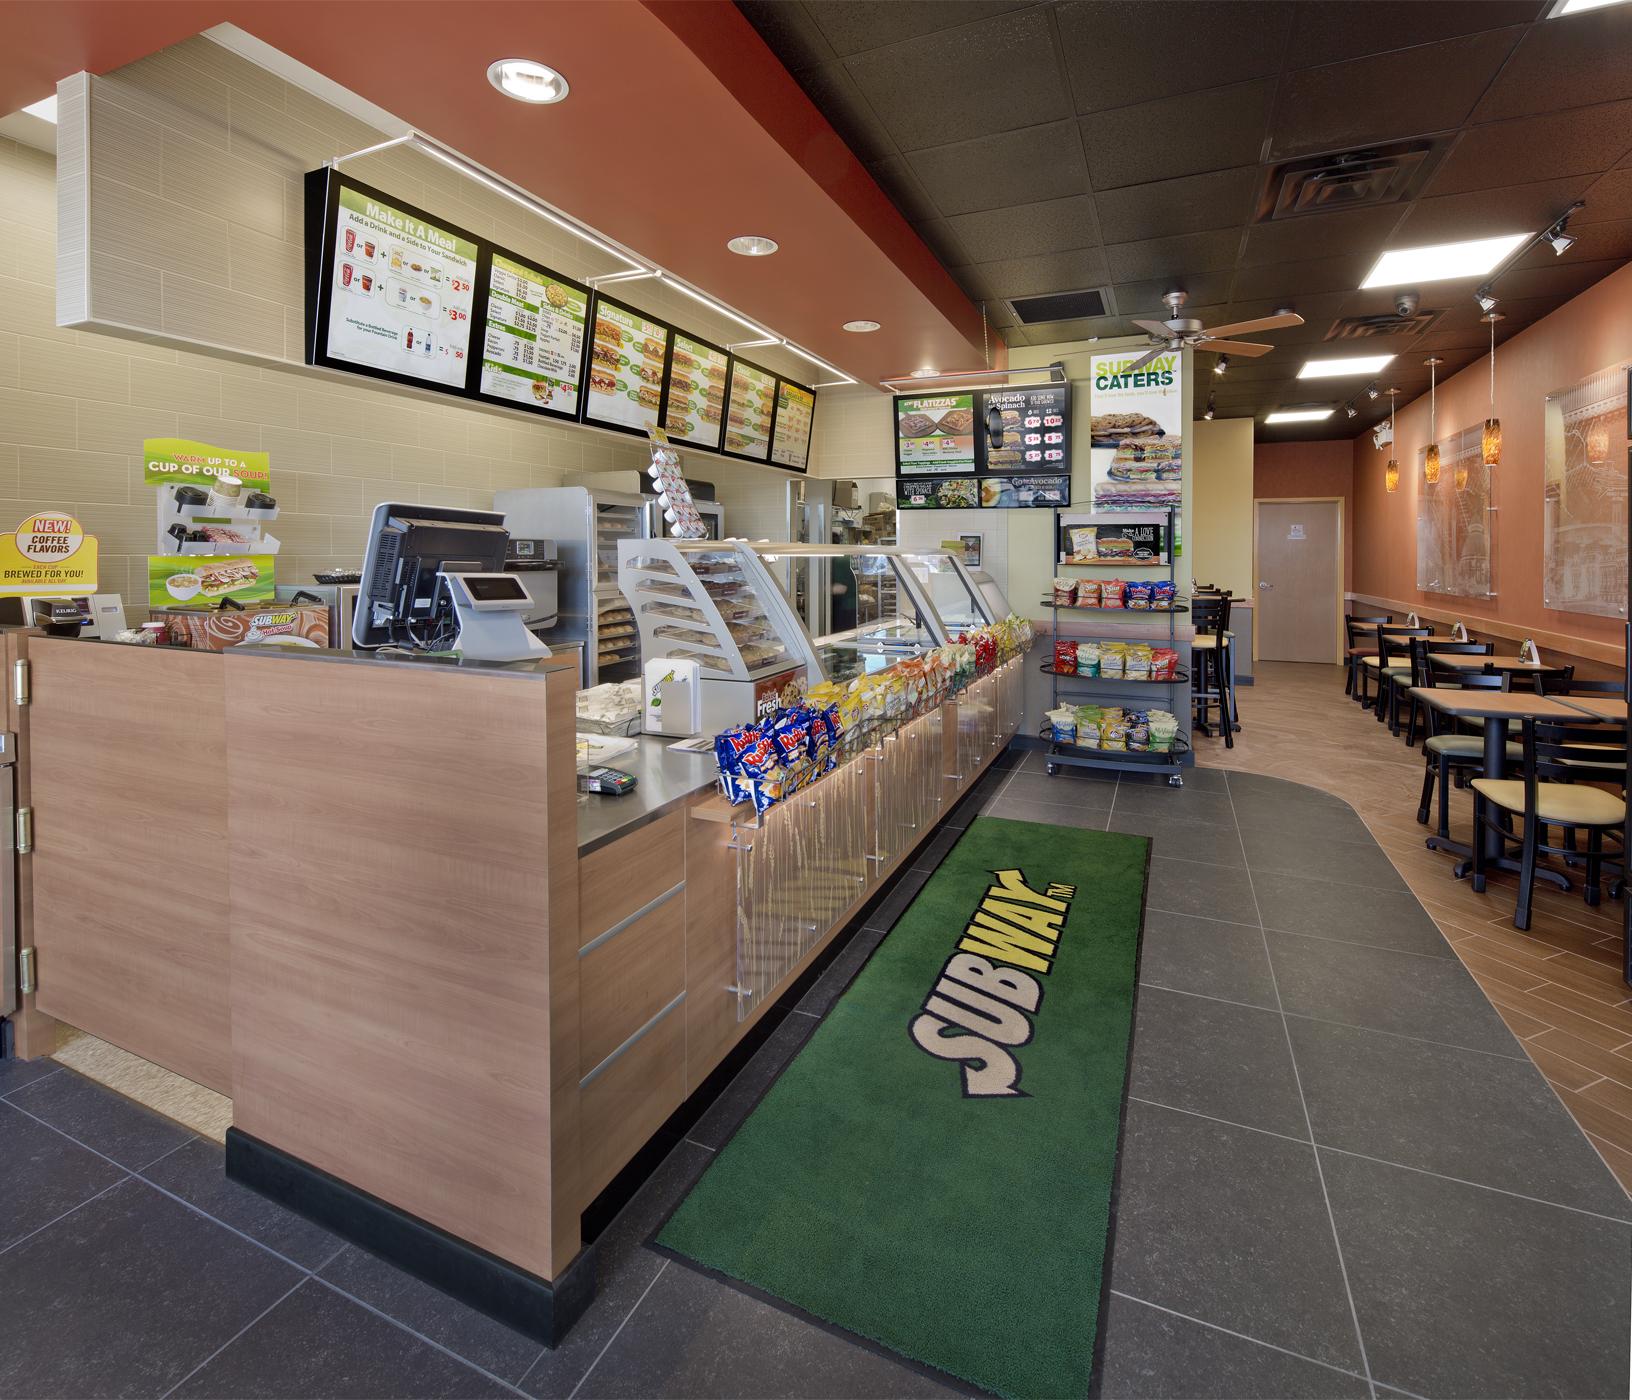 Subway View 1 no employees